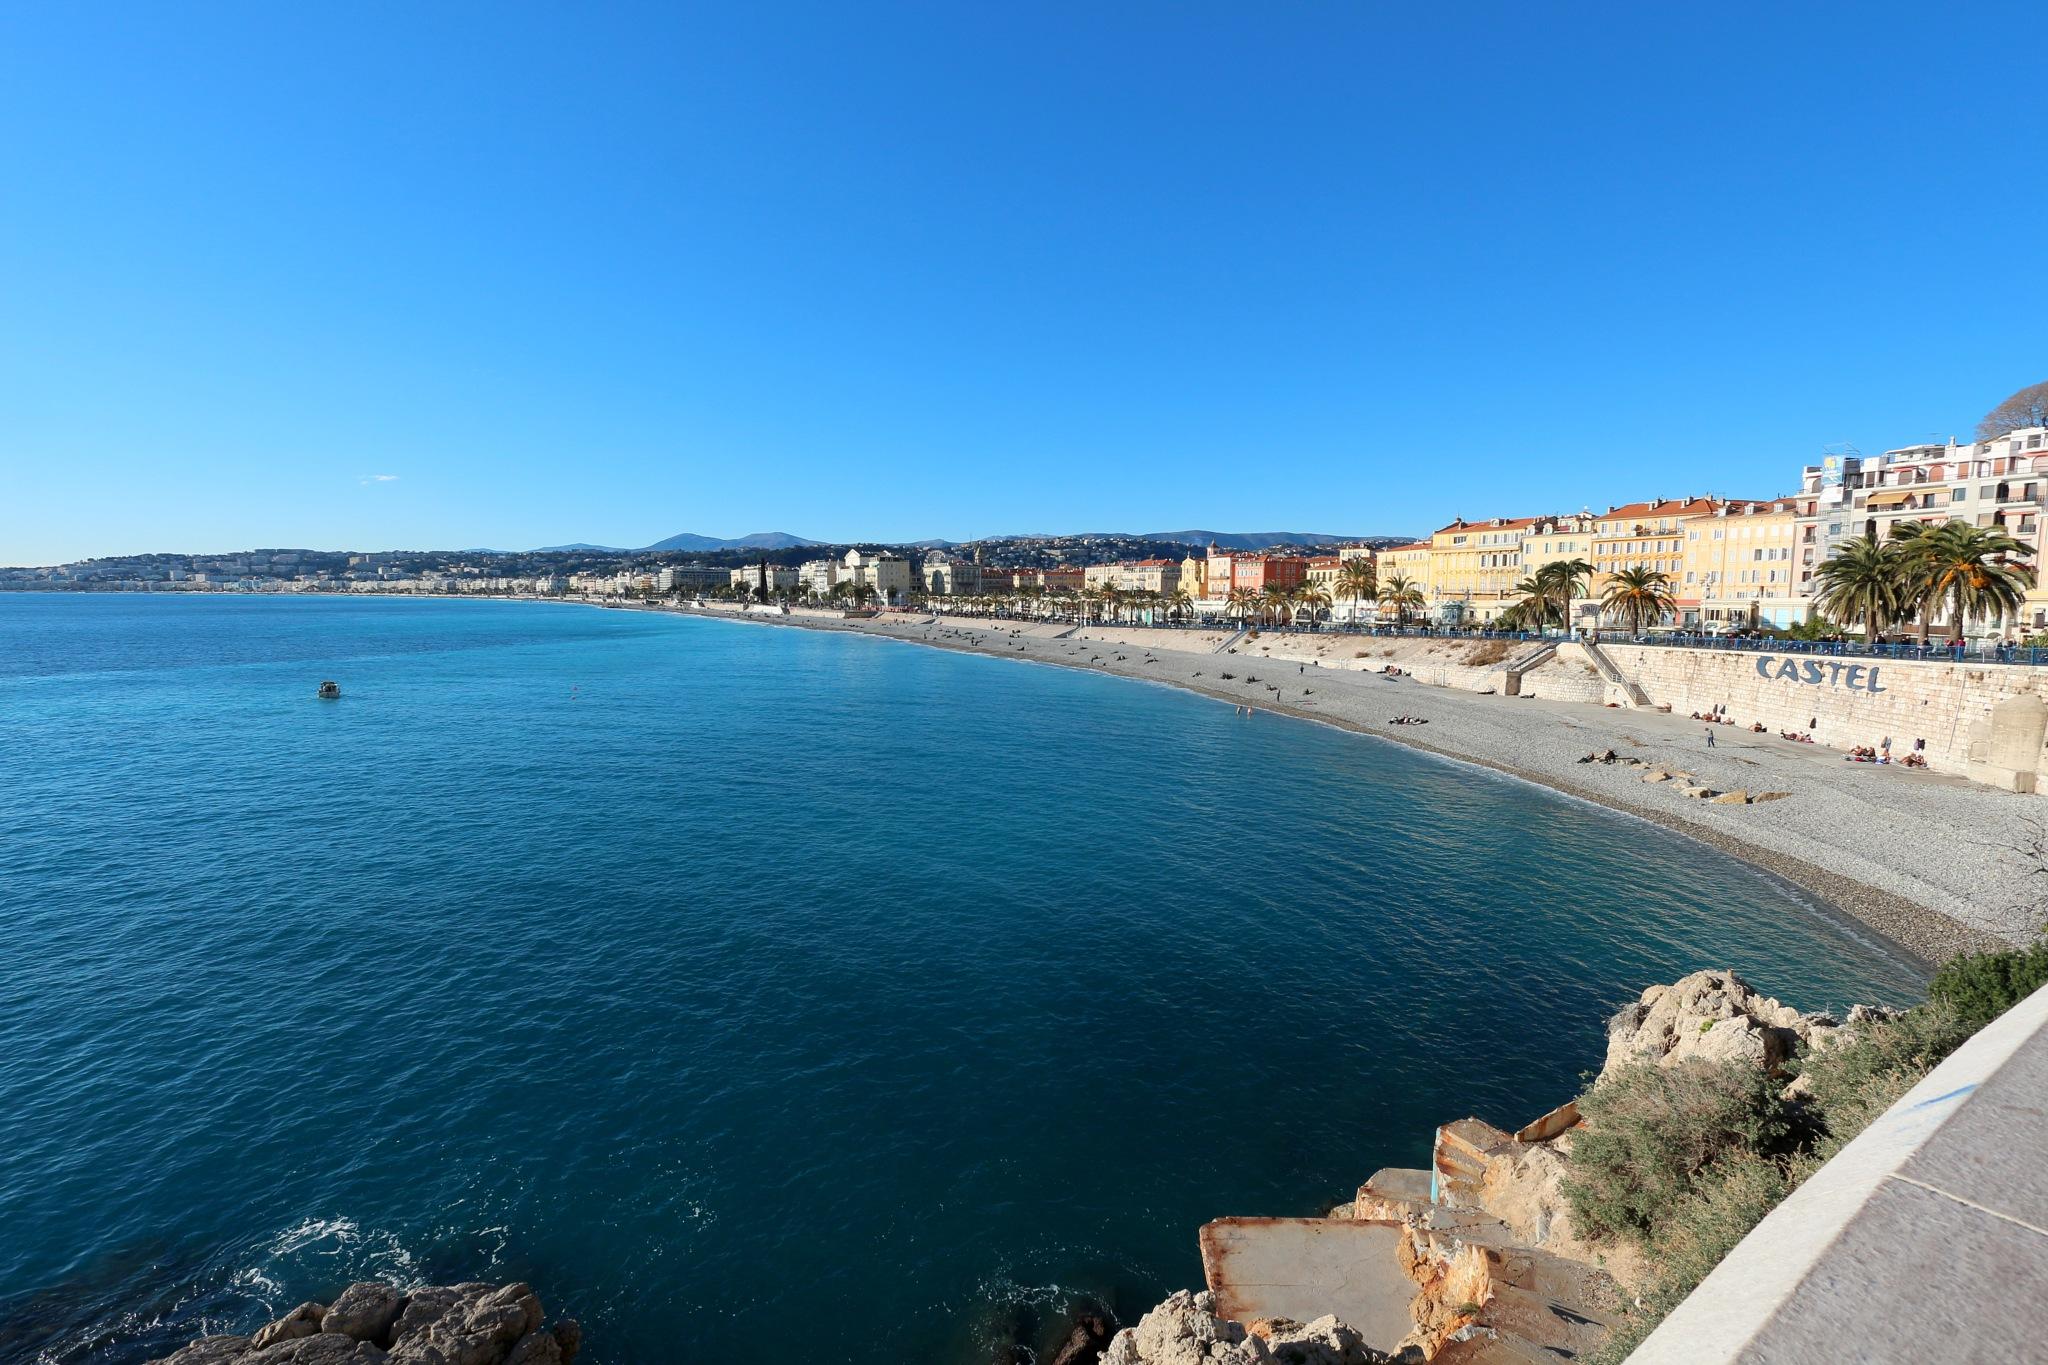 Promenade des Anglais, Nice by katze